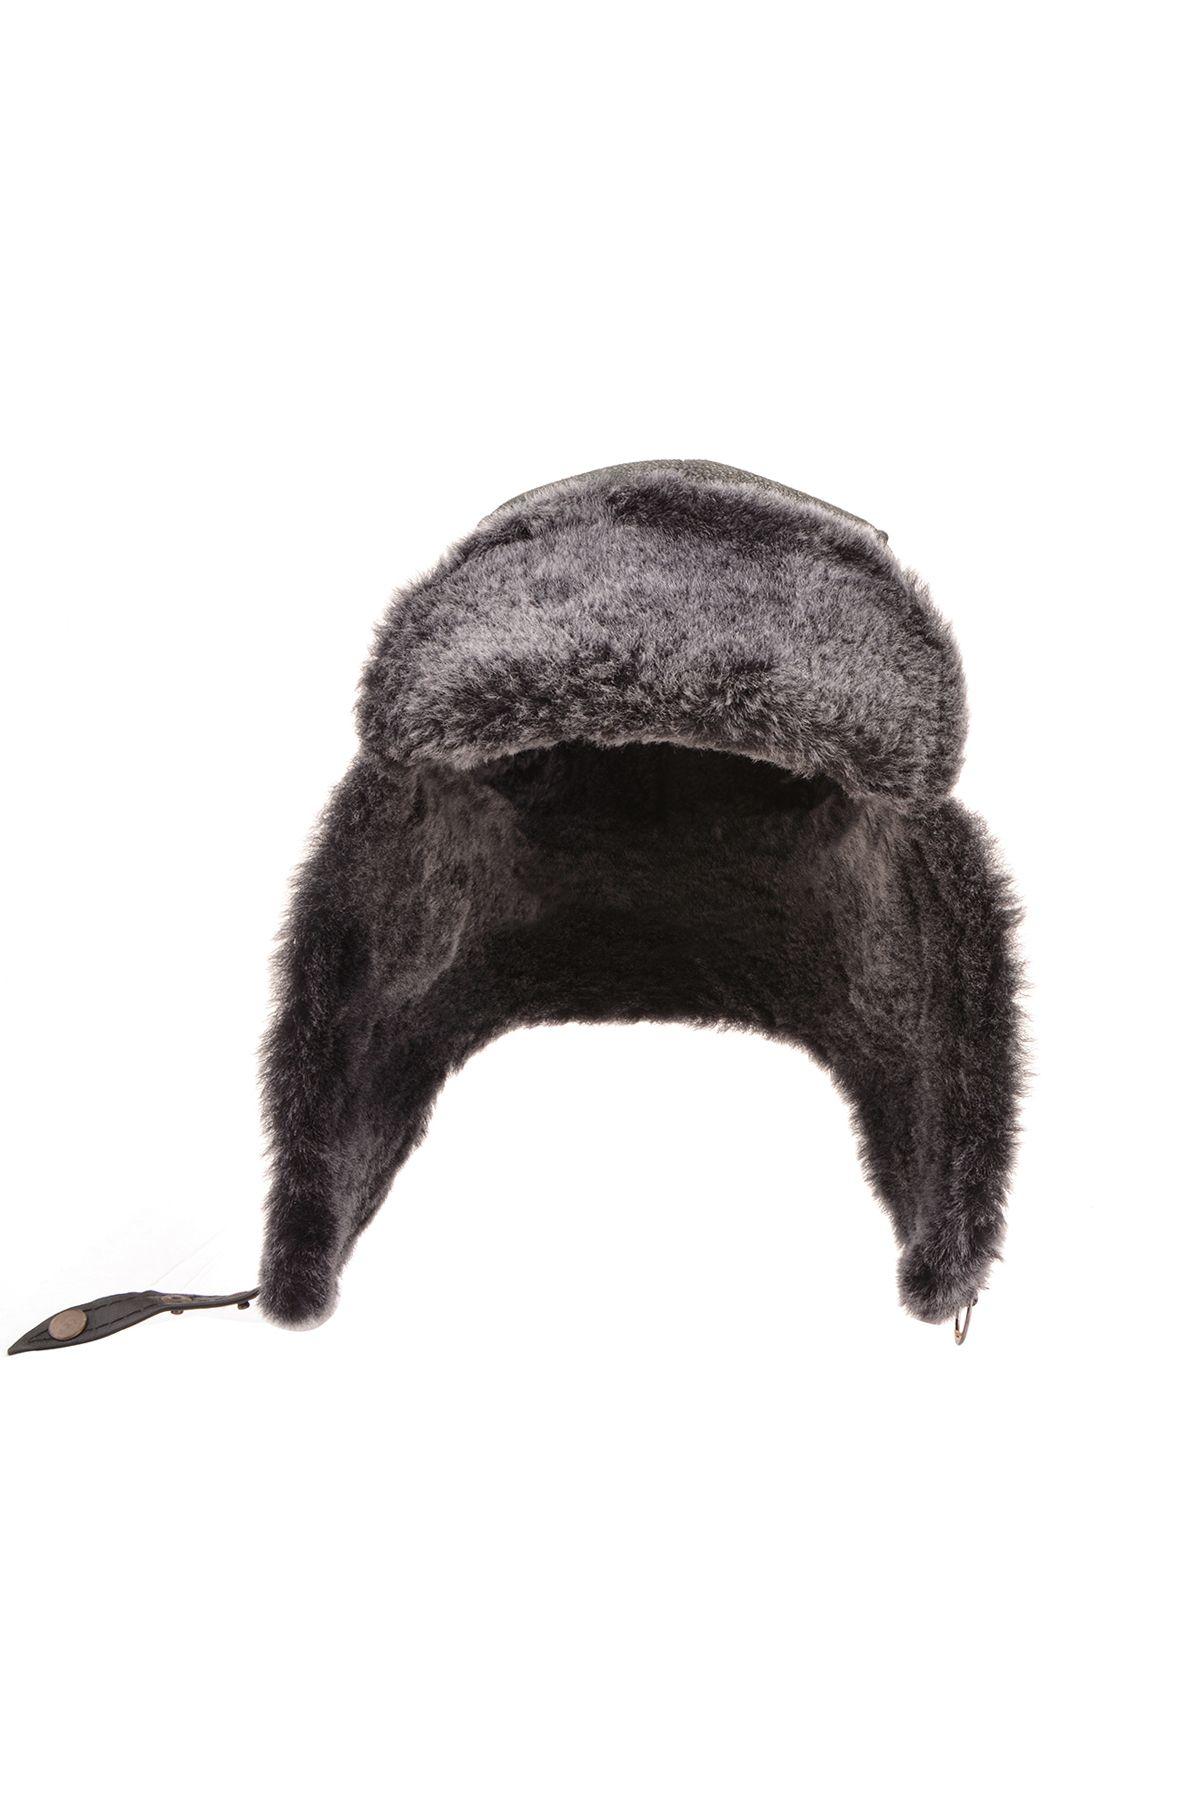 Pegia Hakiki Deri İçi Kürk Pilot Şapka 18AS12 Siyah